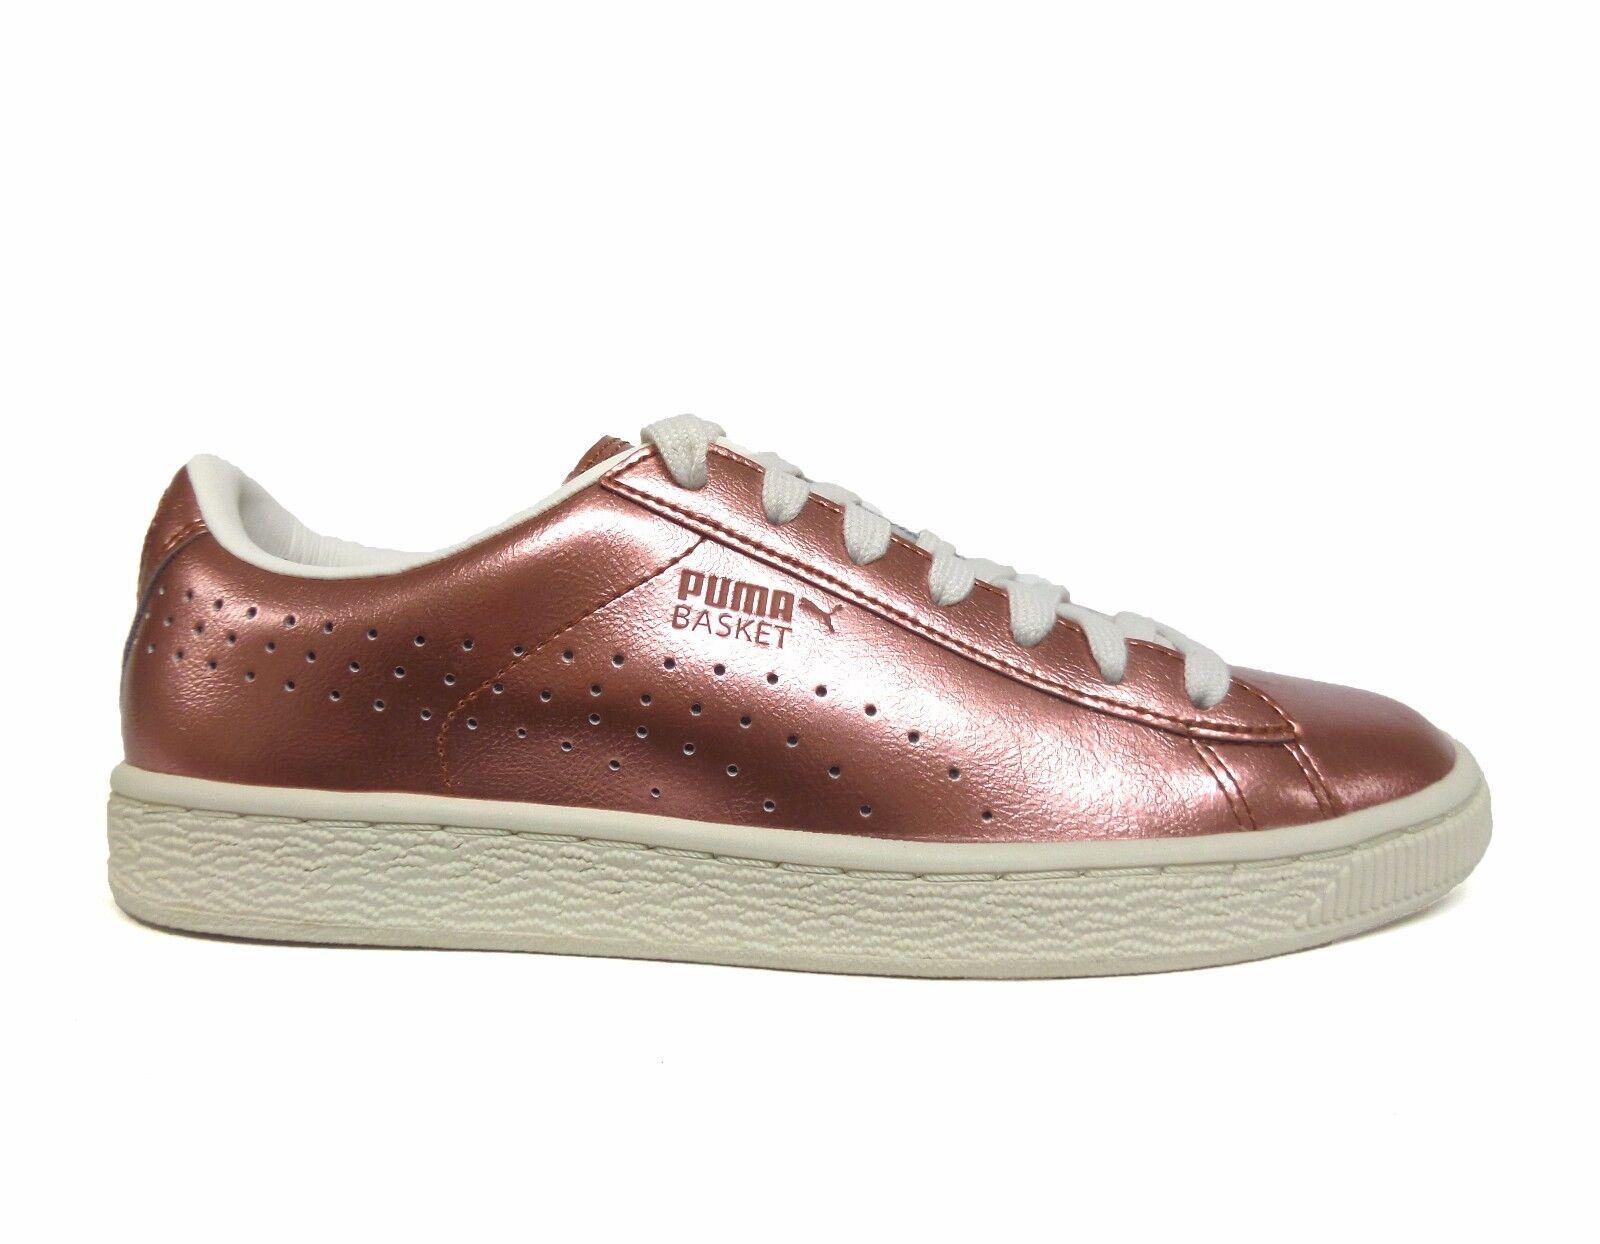 PUMA Women's BASKET CLASSIC CITI METALLIC Shoes Copper/White 364165-01 a Cheap women's shoes women's shoes